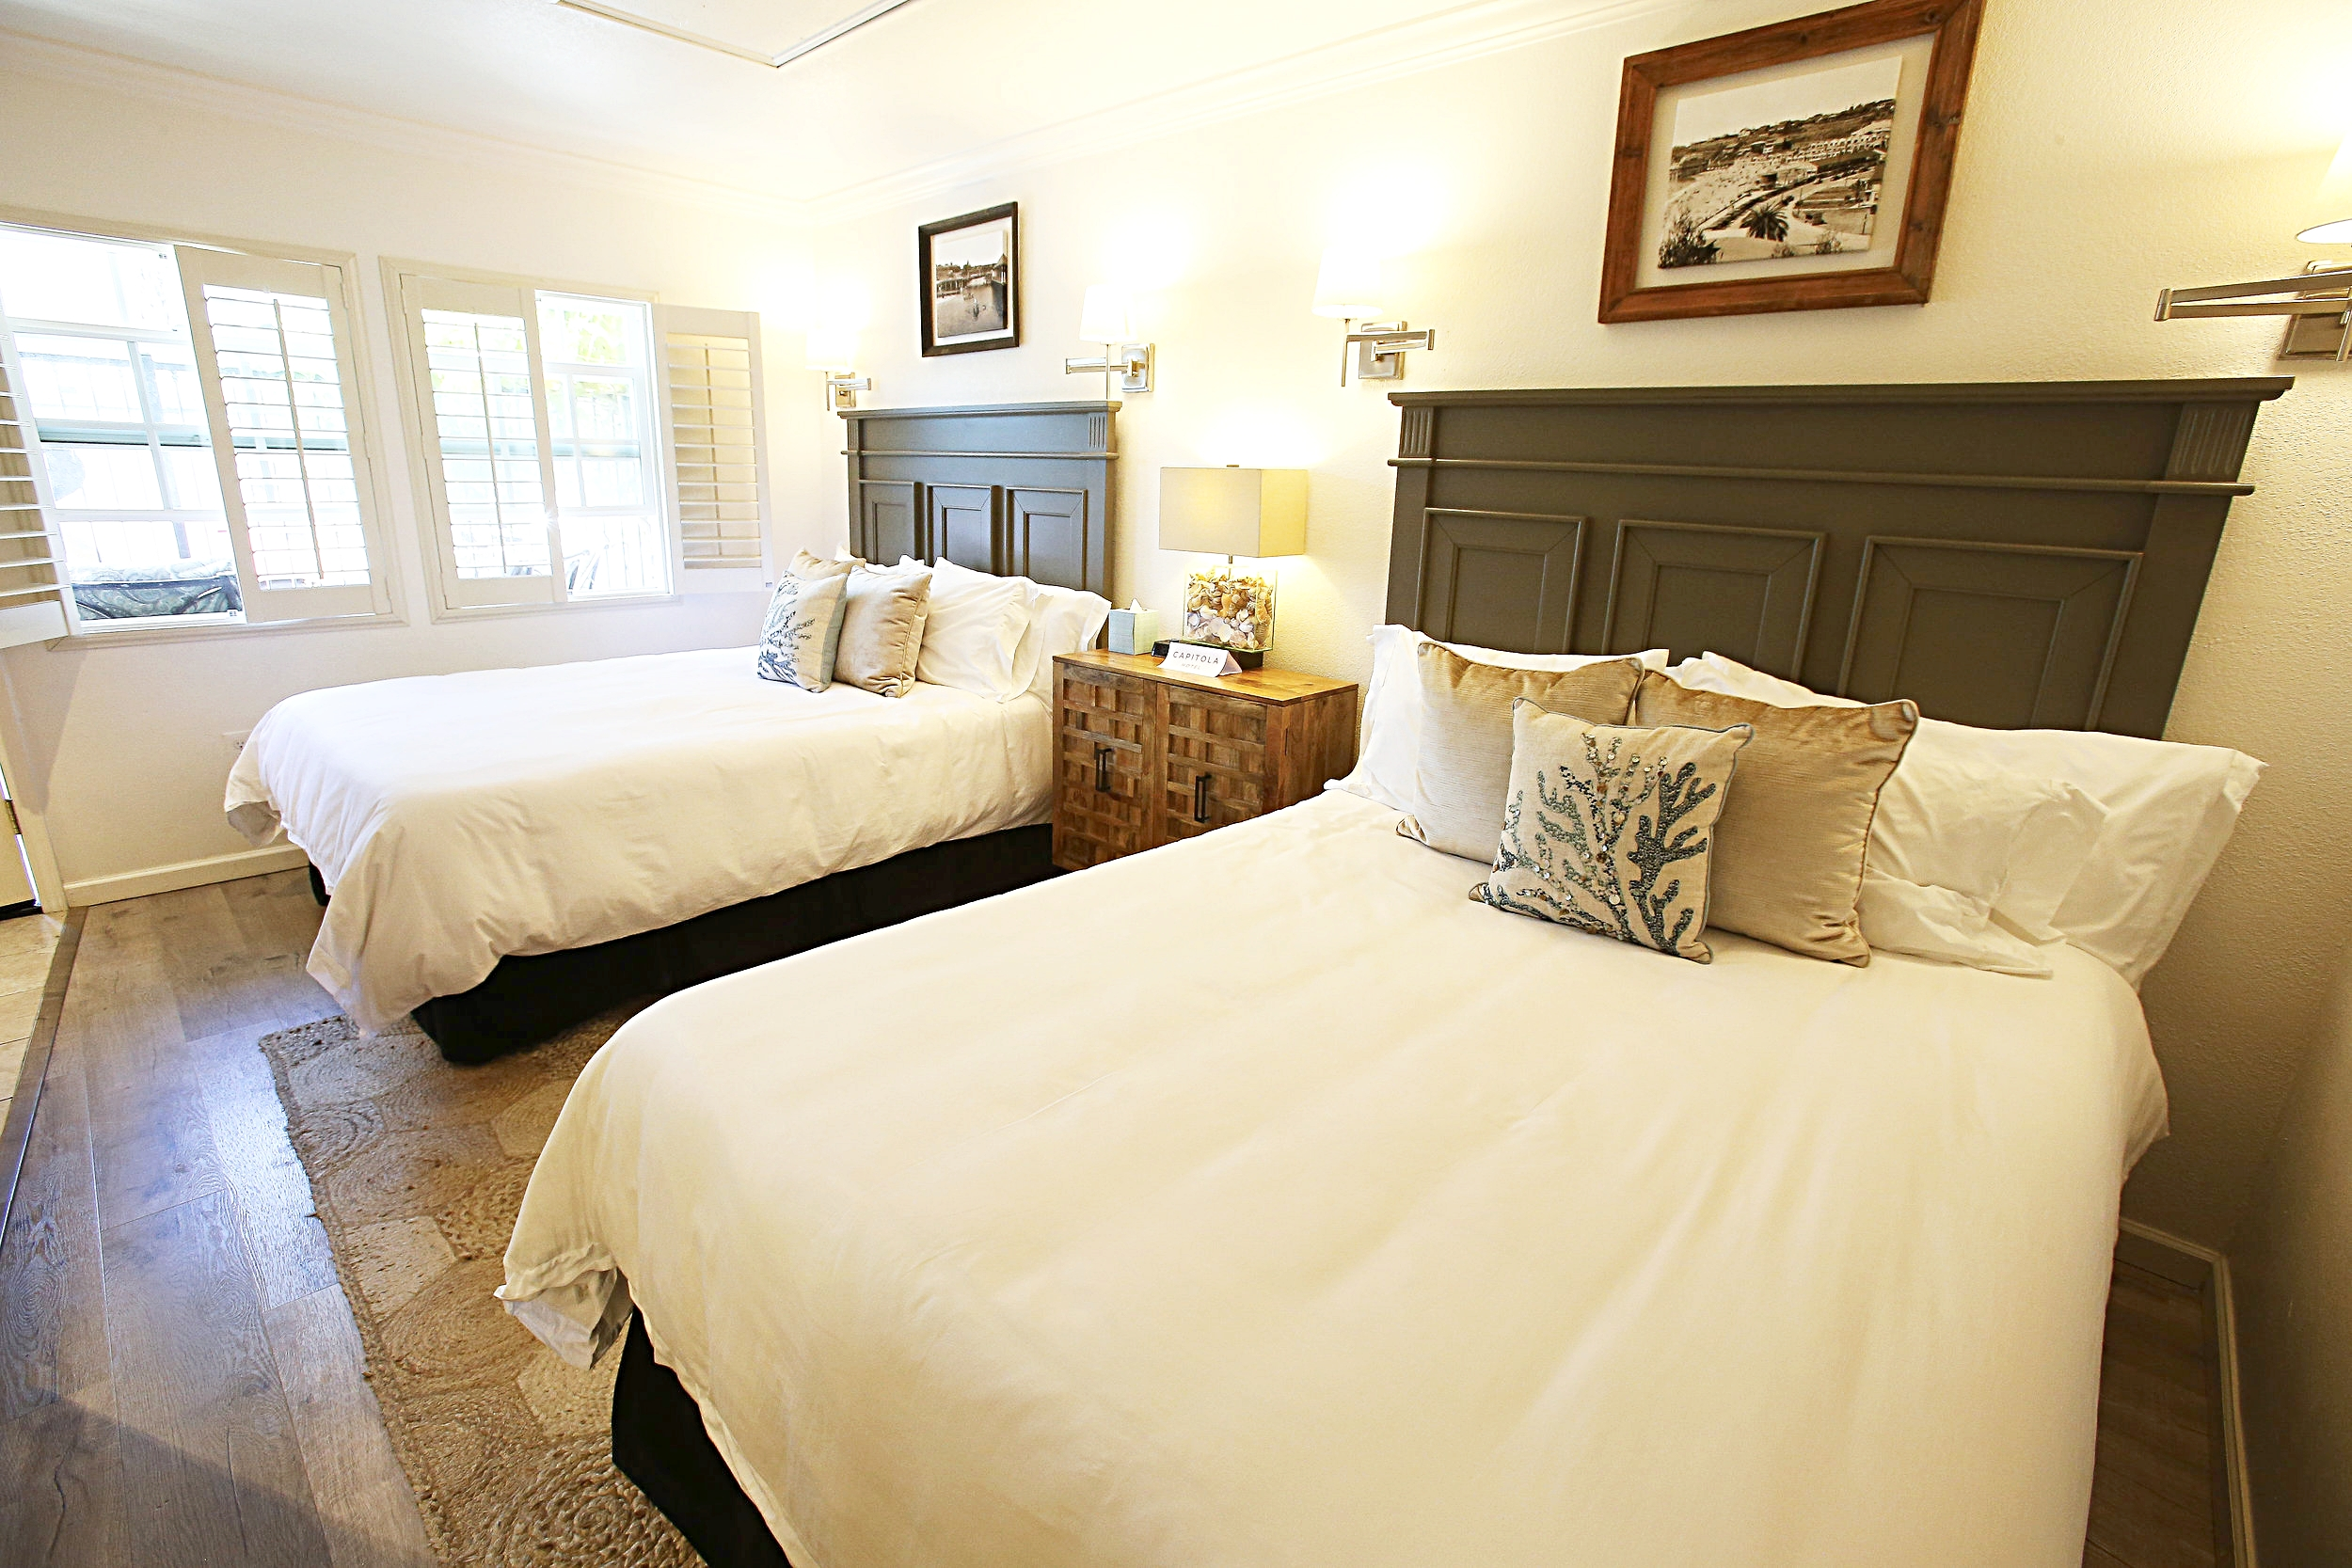 Grand Cayman beds and window.jpg